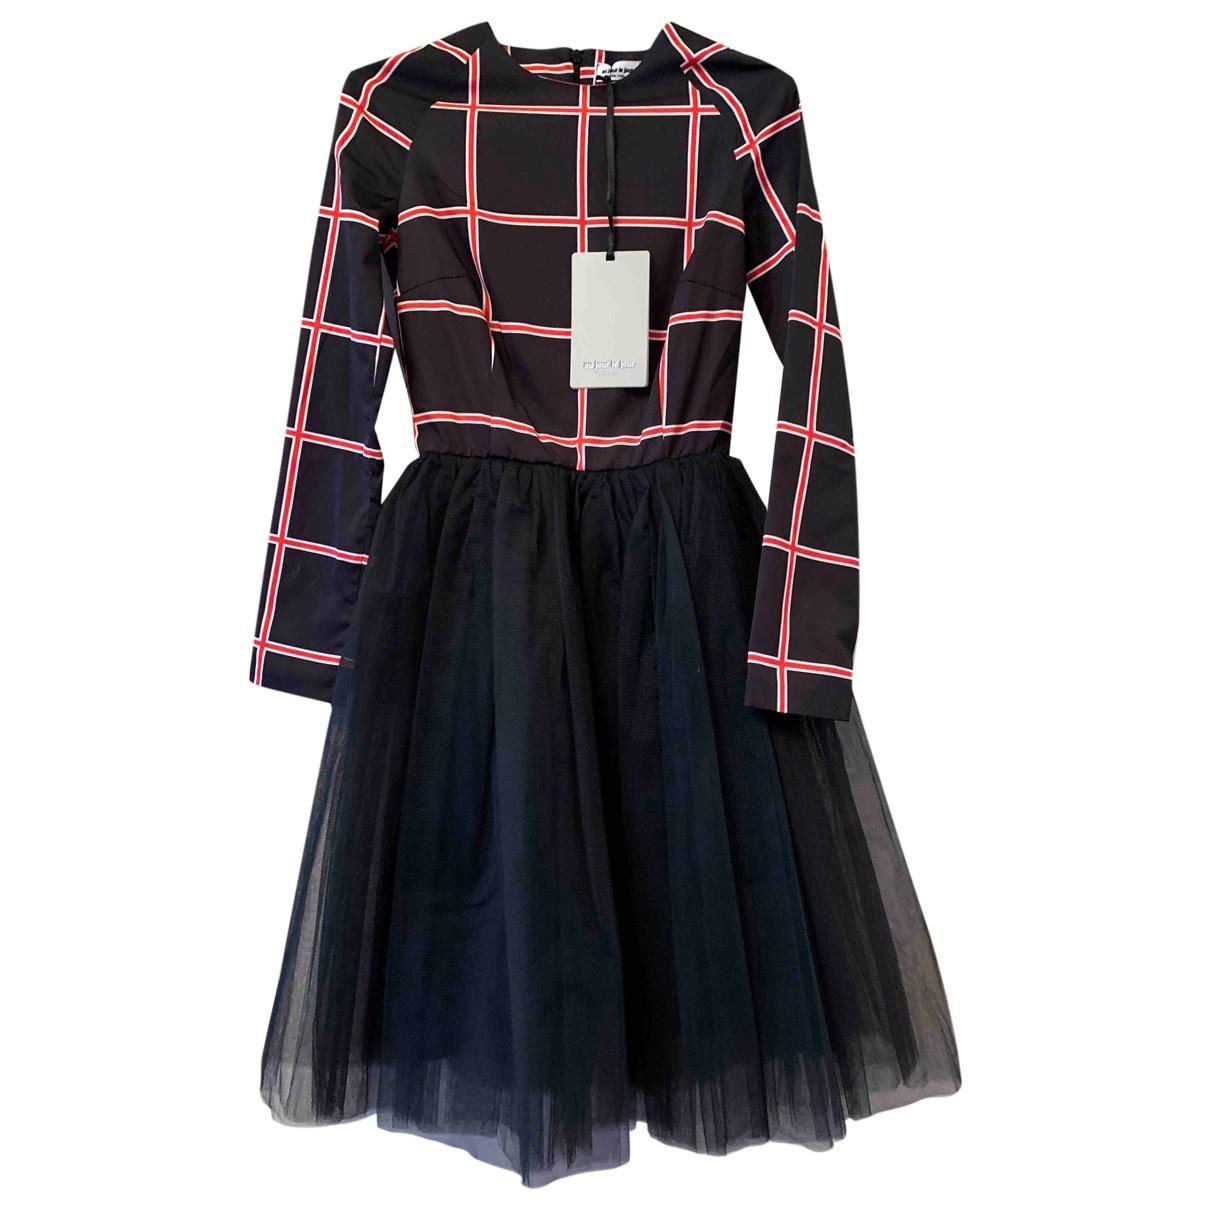 Au Jour Le Jour \N Kleid in  Schwarz Polyester